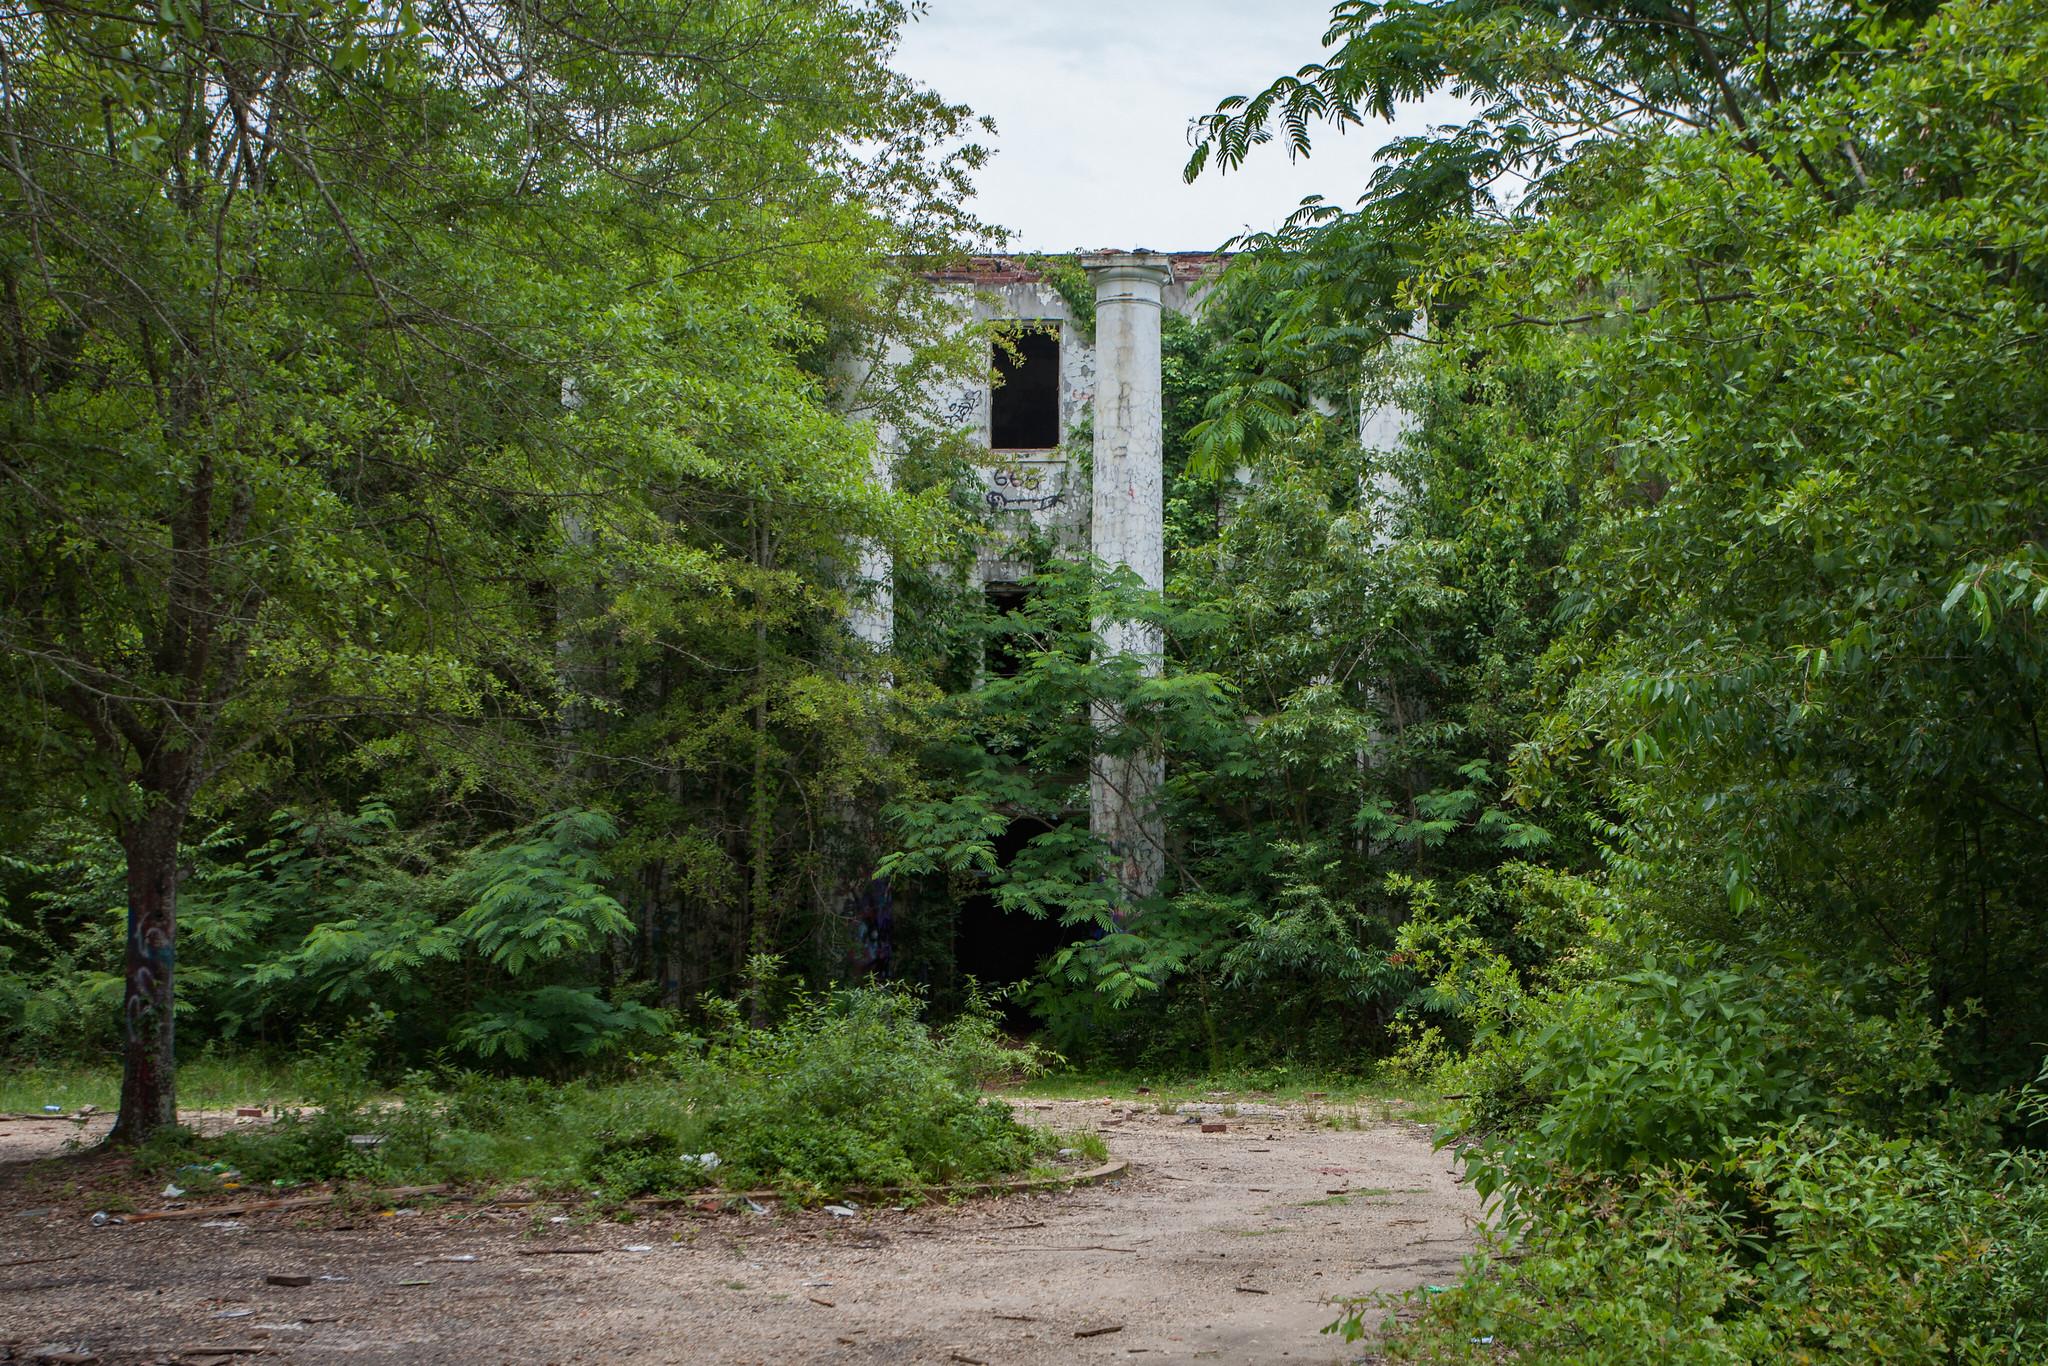 Jemison Center Abandoned Southeast